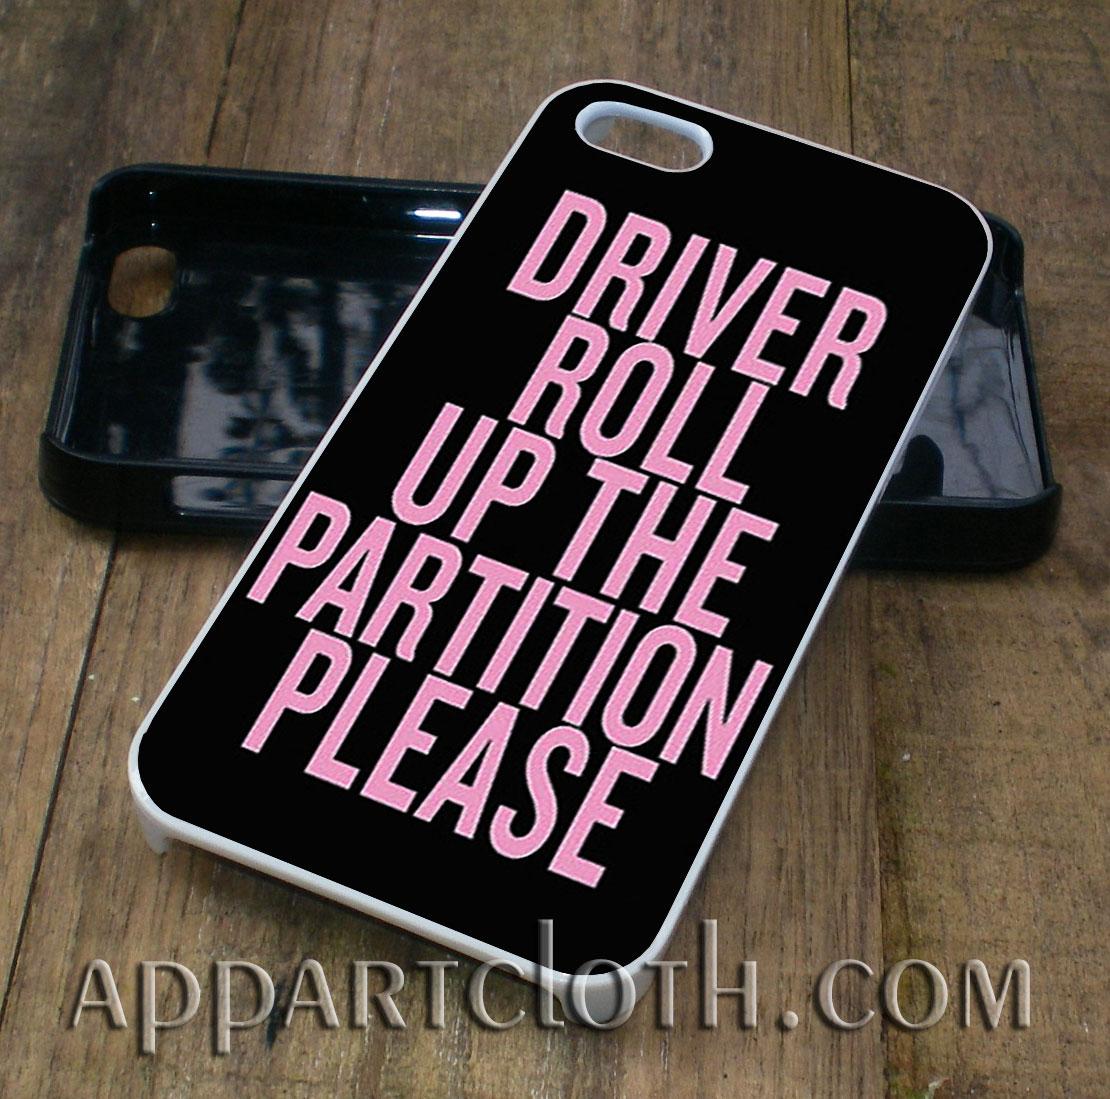 beyonce partition lyric phone case iphone case, samsung case